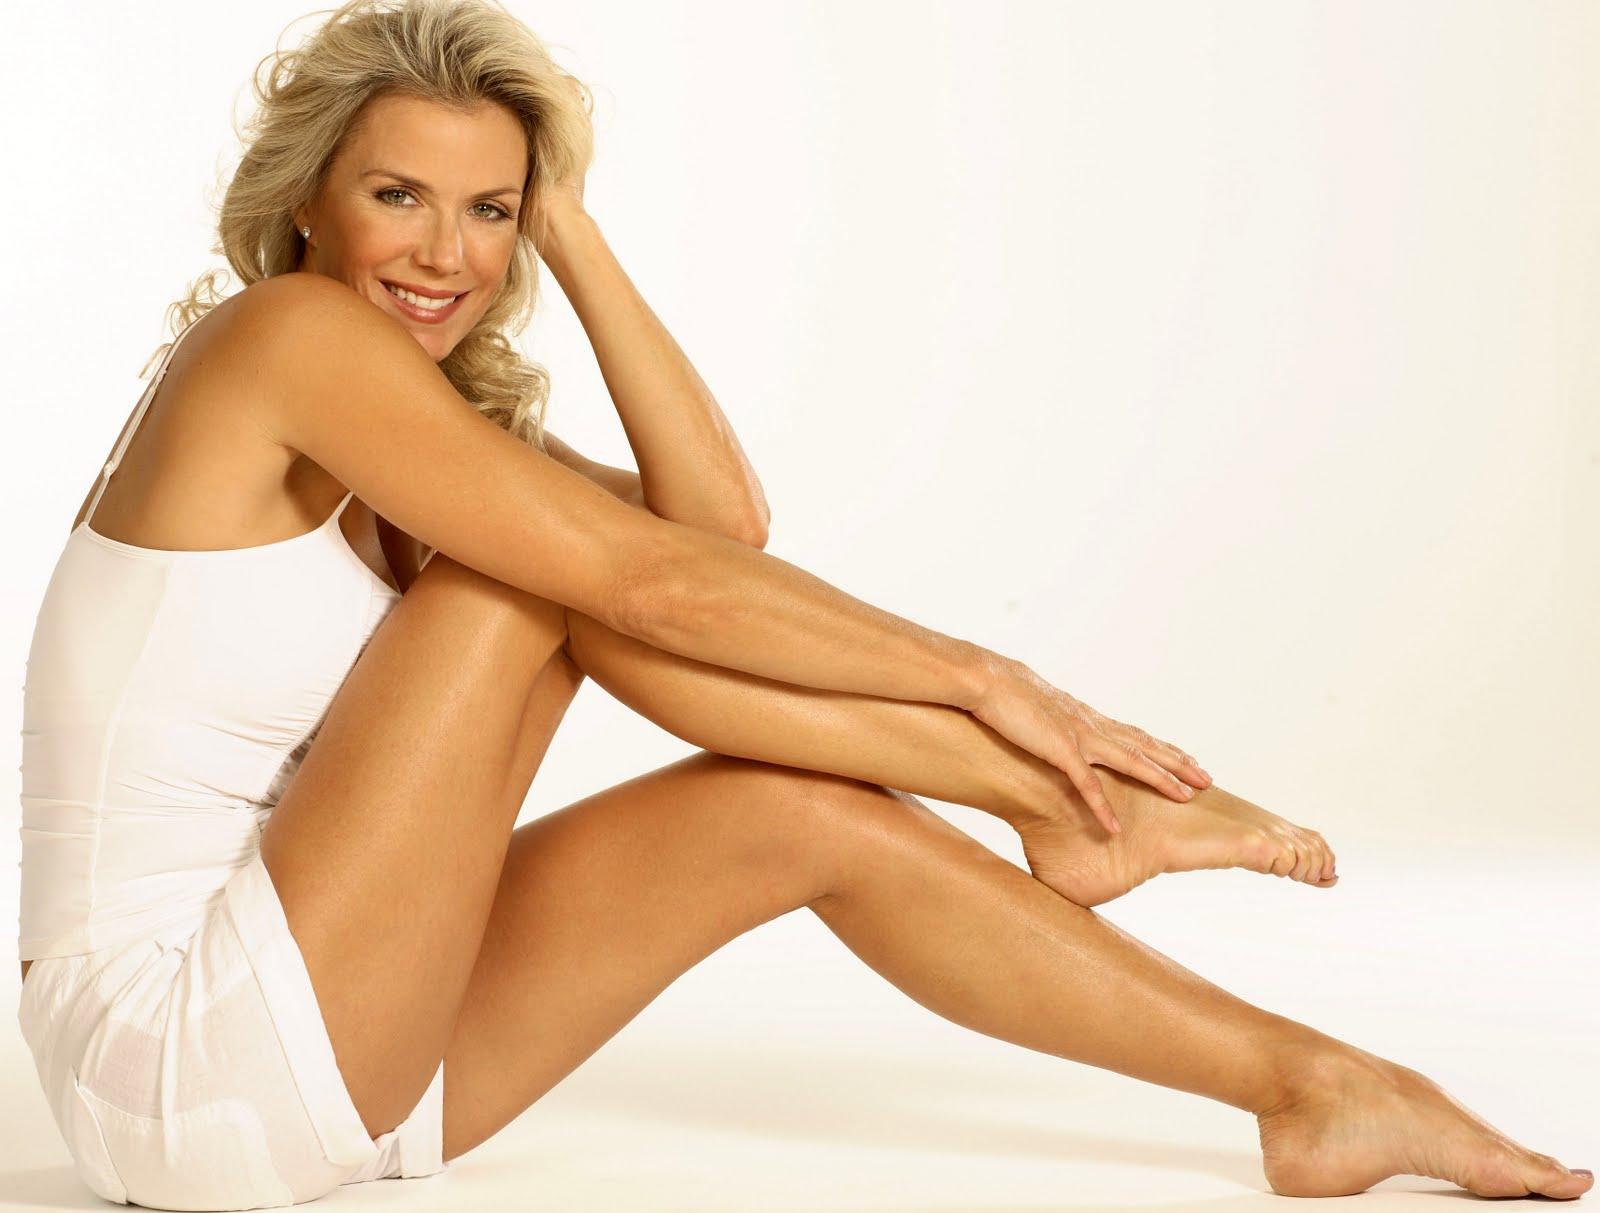 Tits Bikini Paula Trueman  nudes (81 pictures), YouTube, underwear